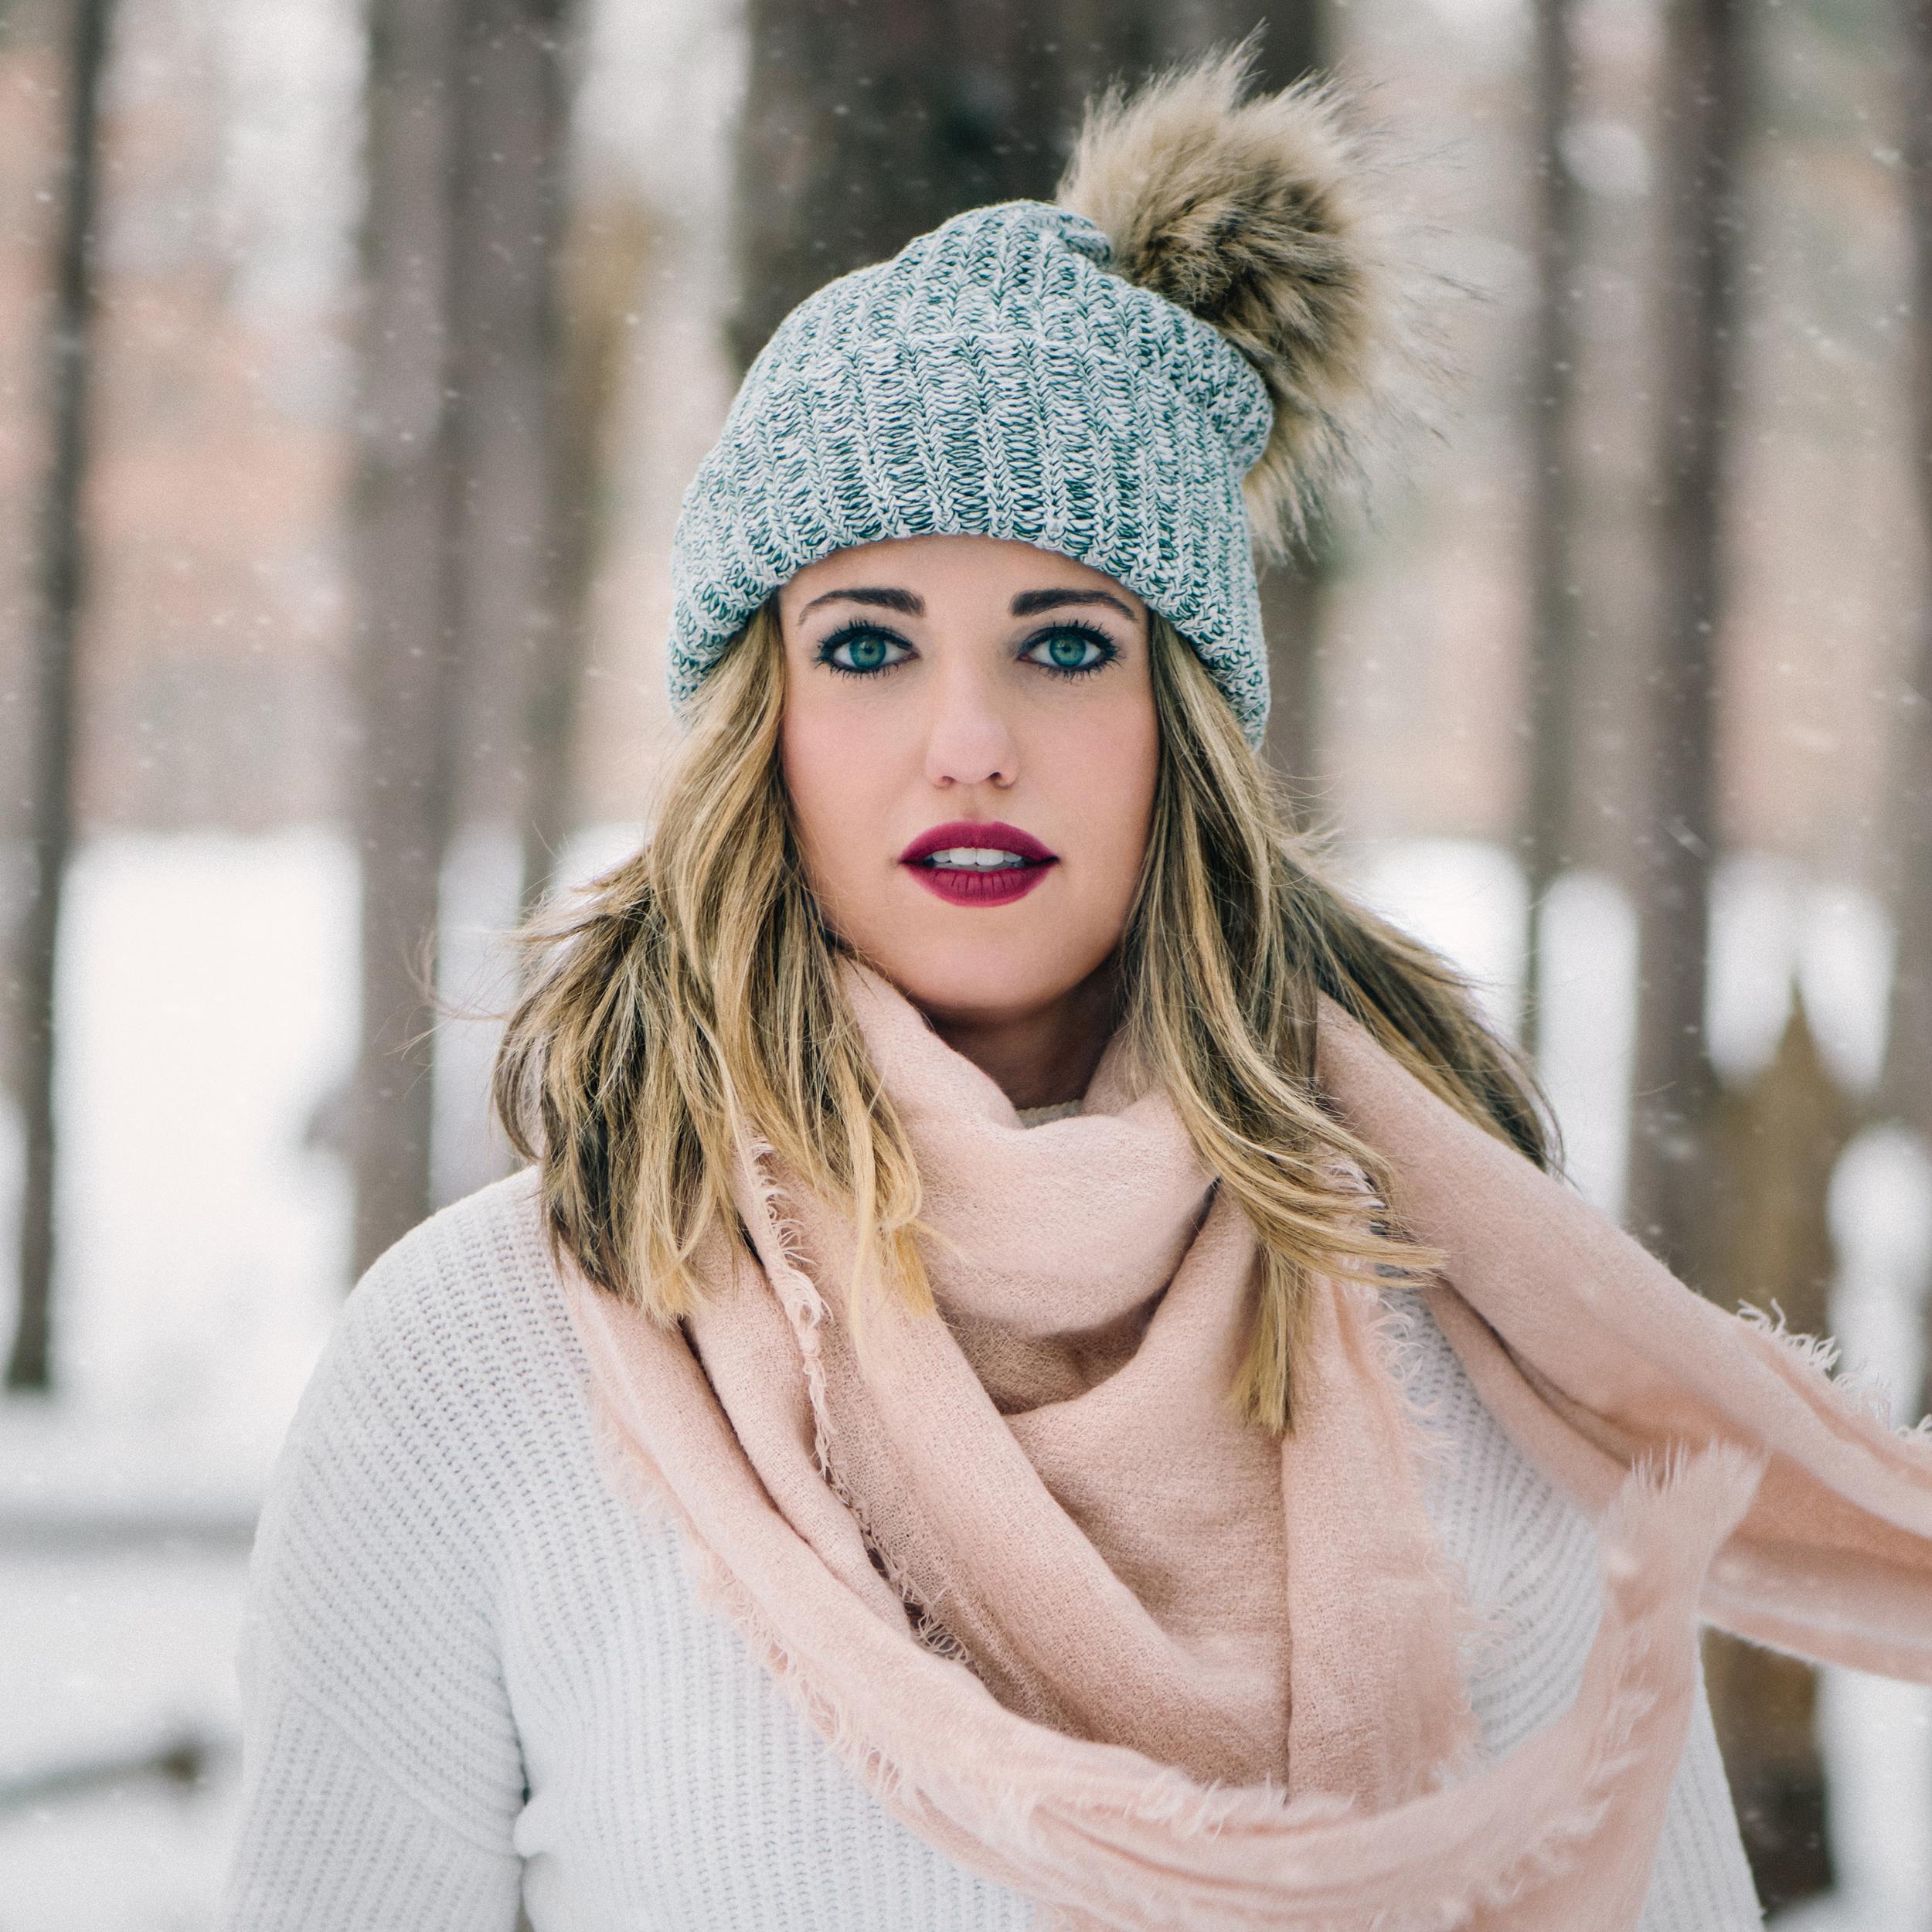 Jessica-Sulier-4.jpg